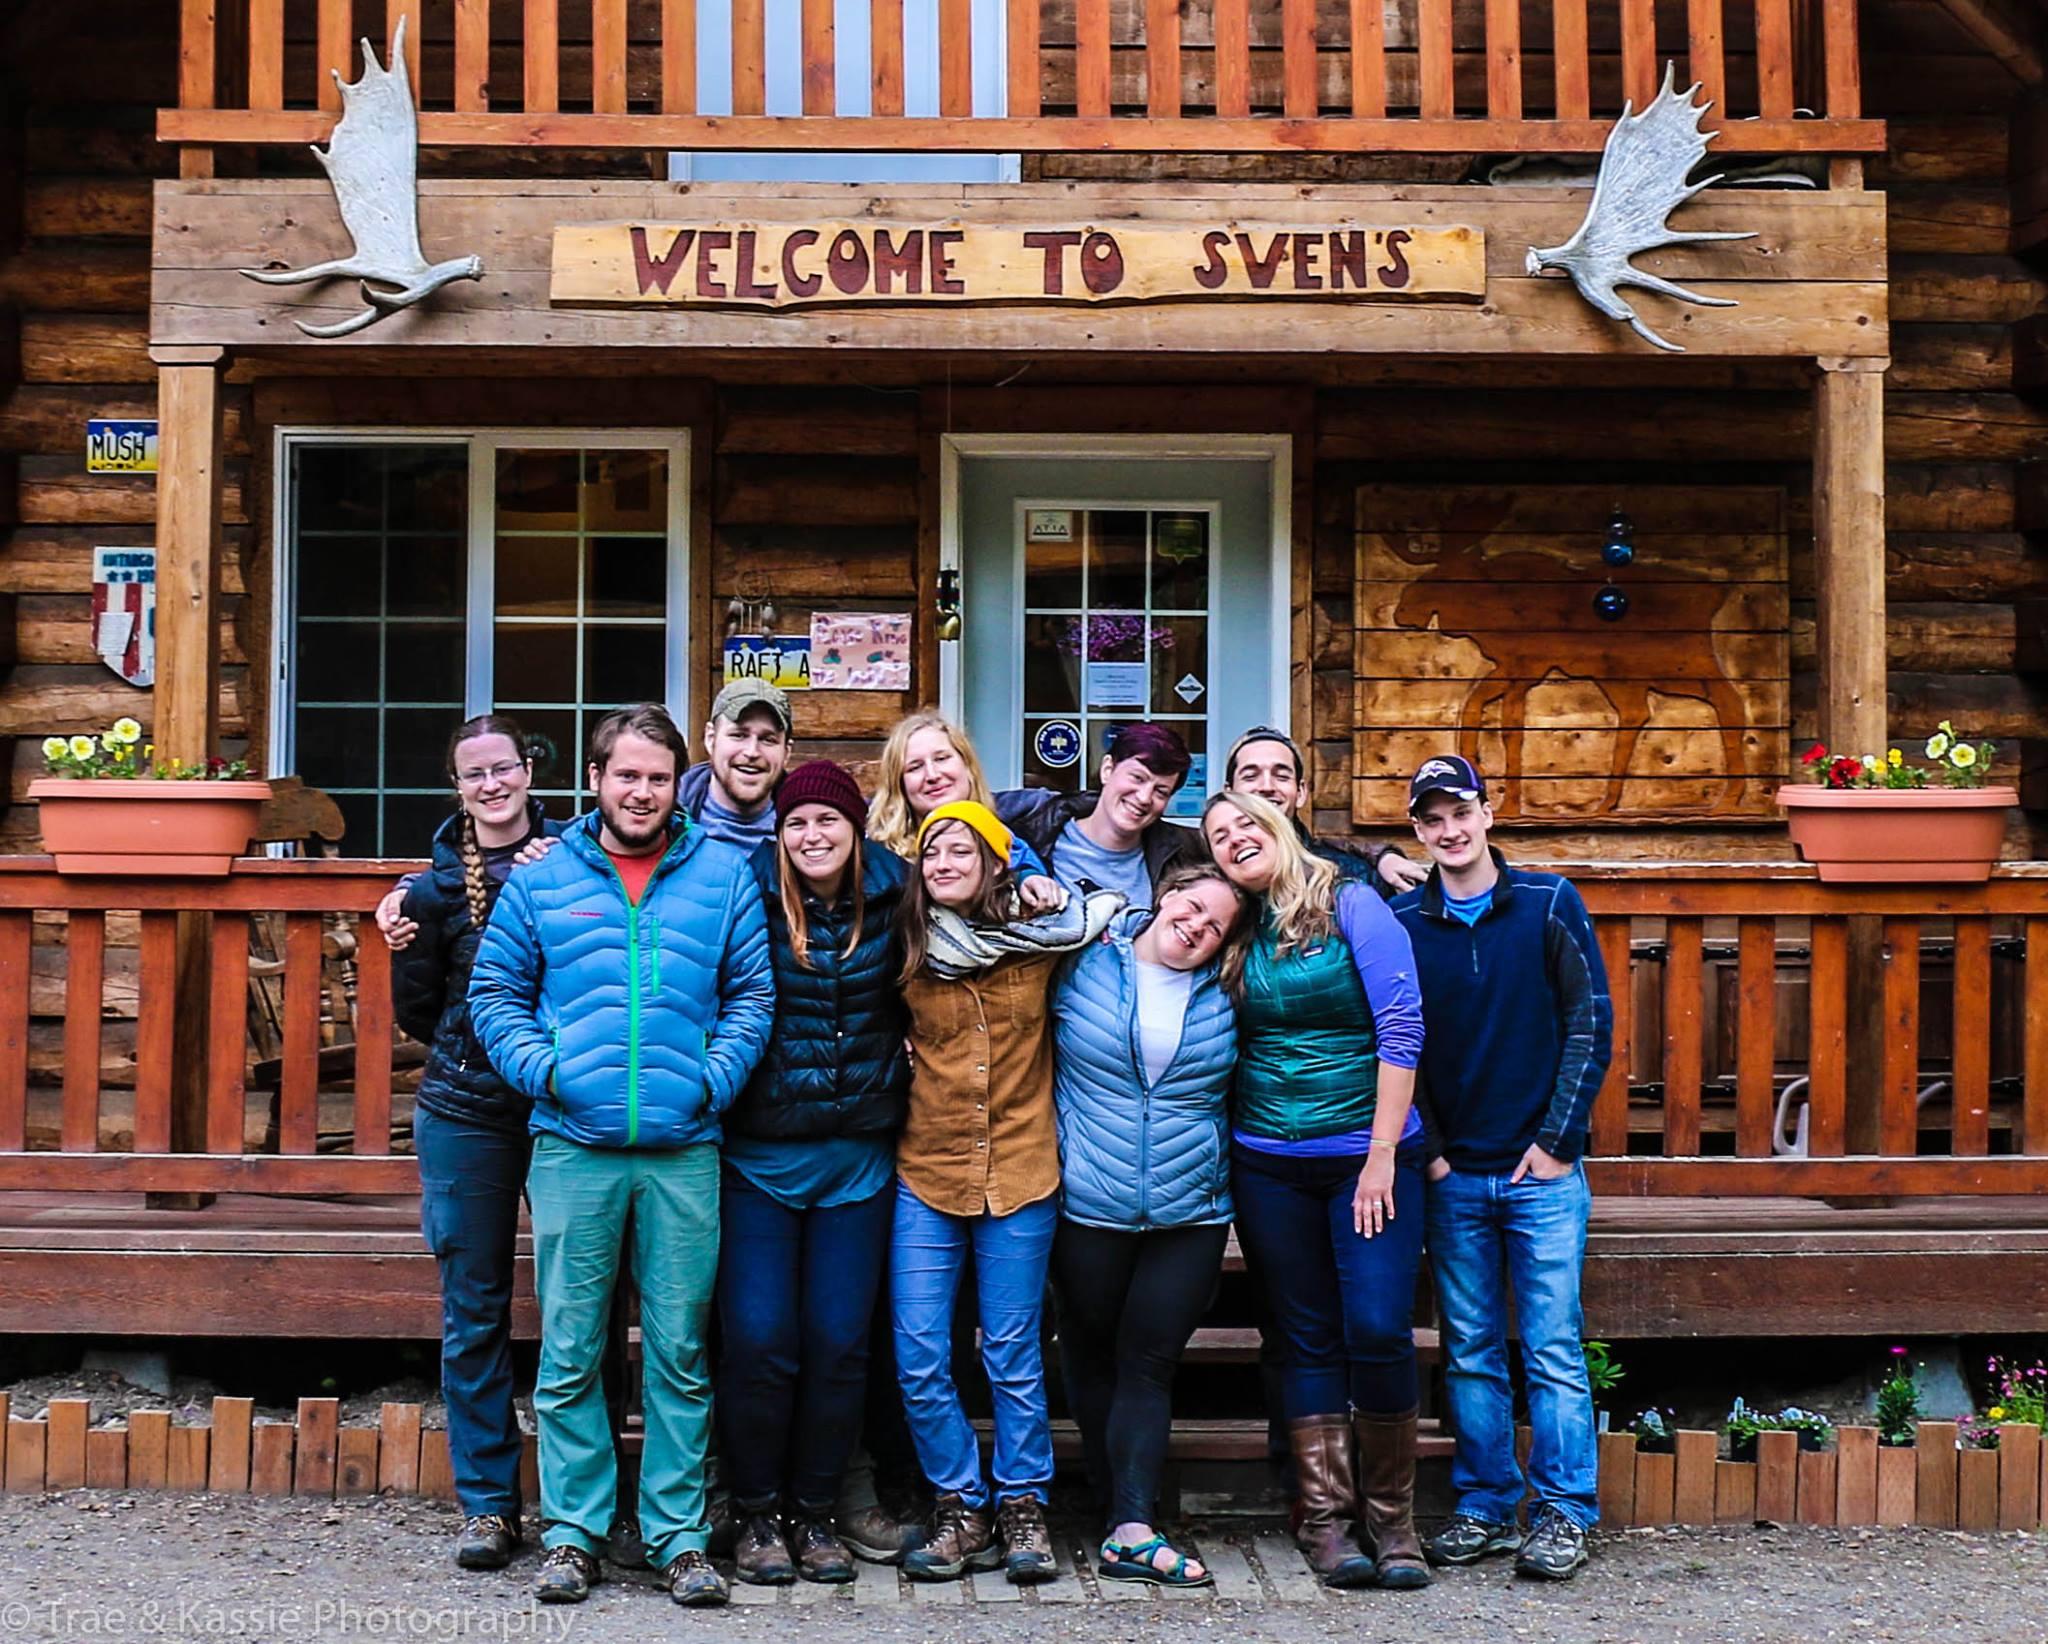 Hostel Photo 7.jpg